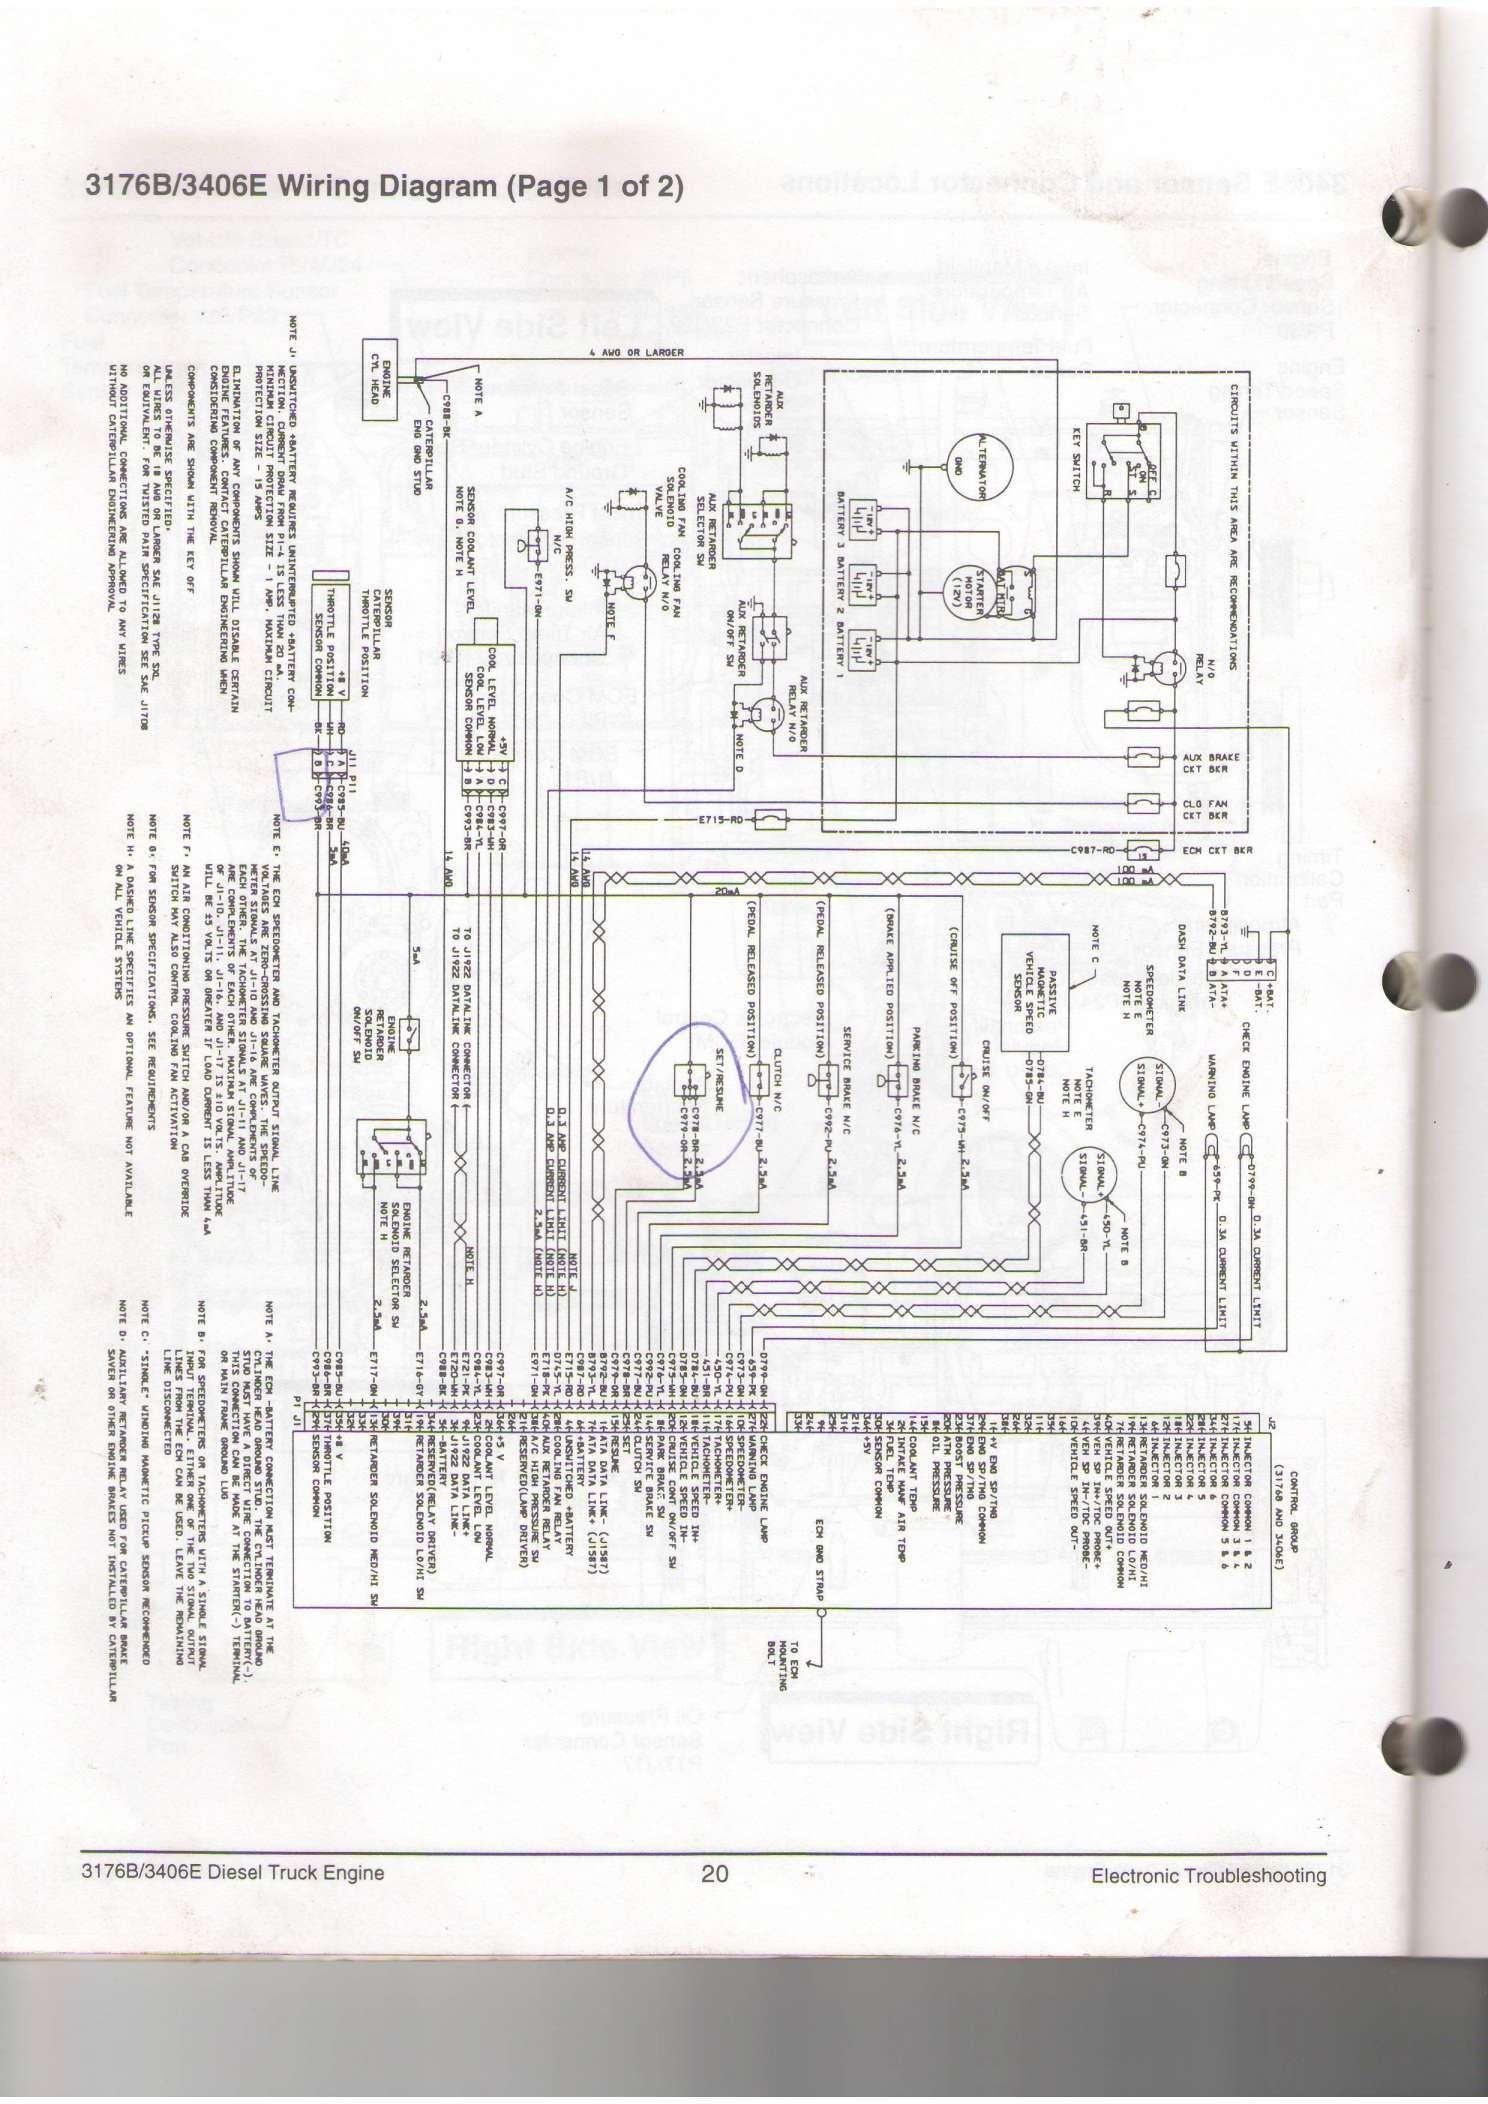 Caterpillar C7 Engine Wiring Diagram And Caterpillar C Engine Wiring Diagram Wiring Diagram Source Diagrama De Circuito Circuito